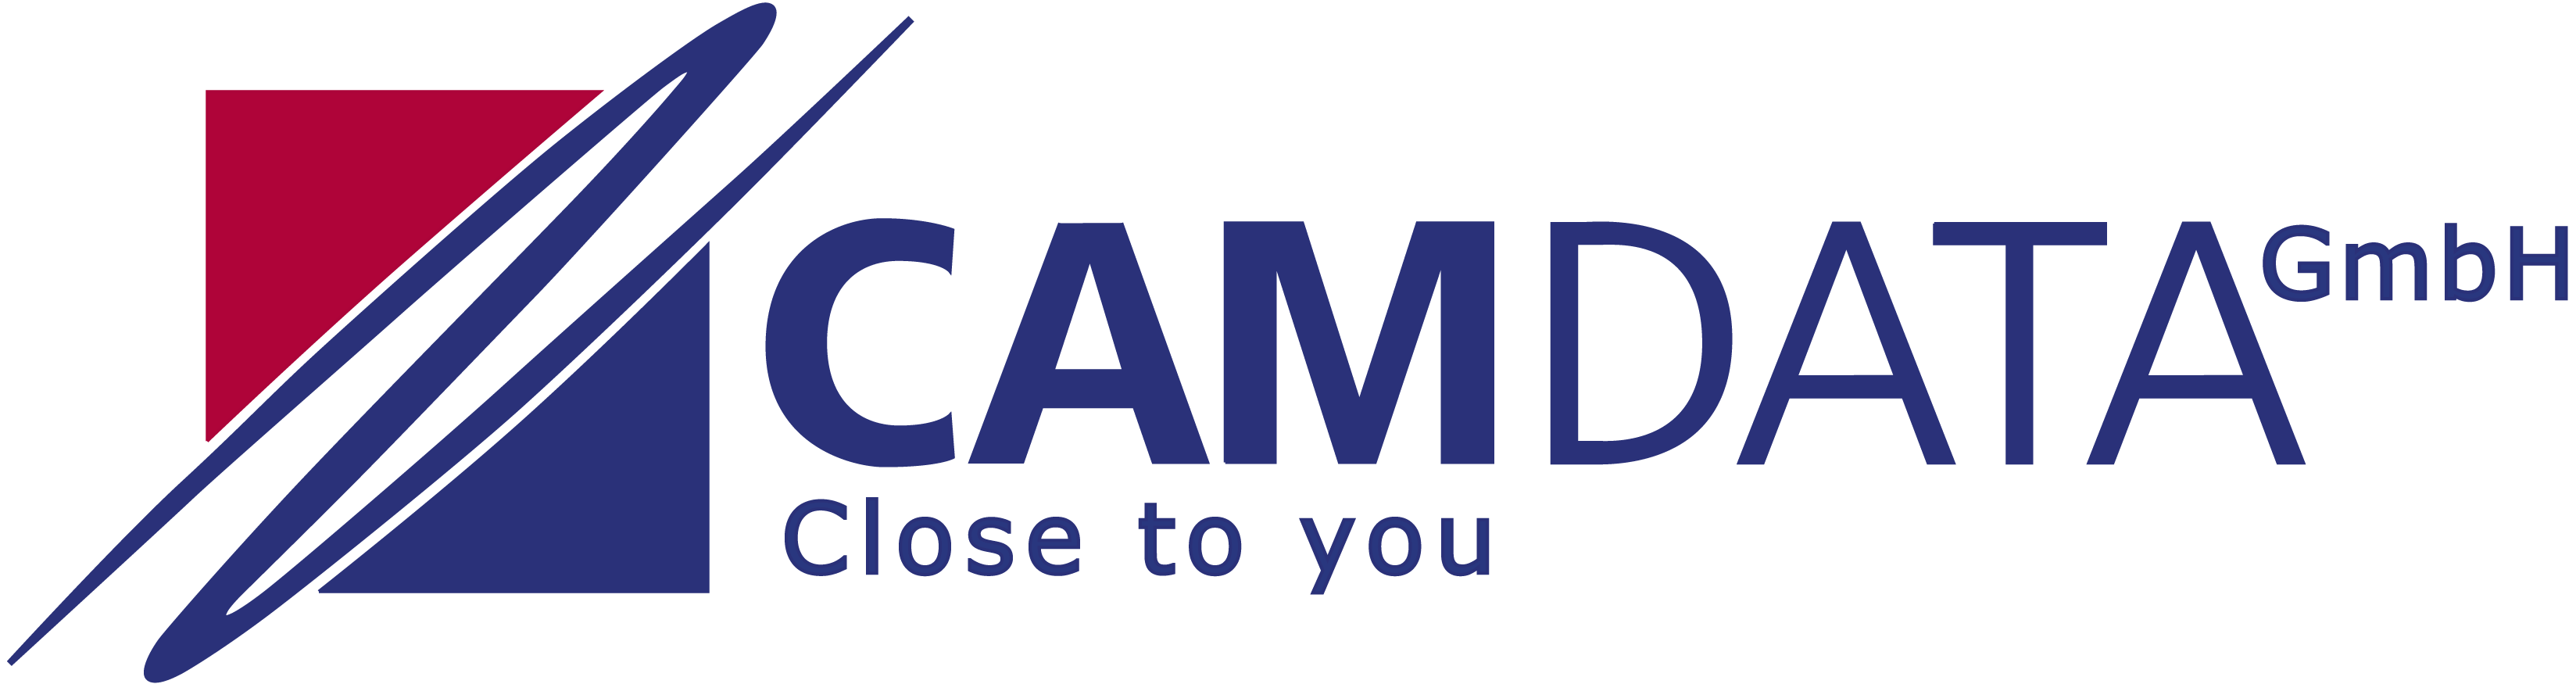 CamData Logo: Univention Partner